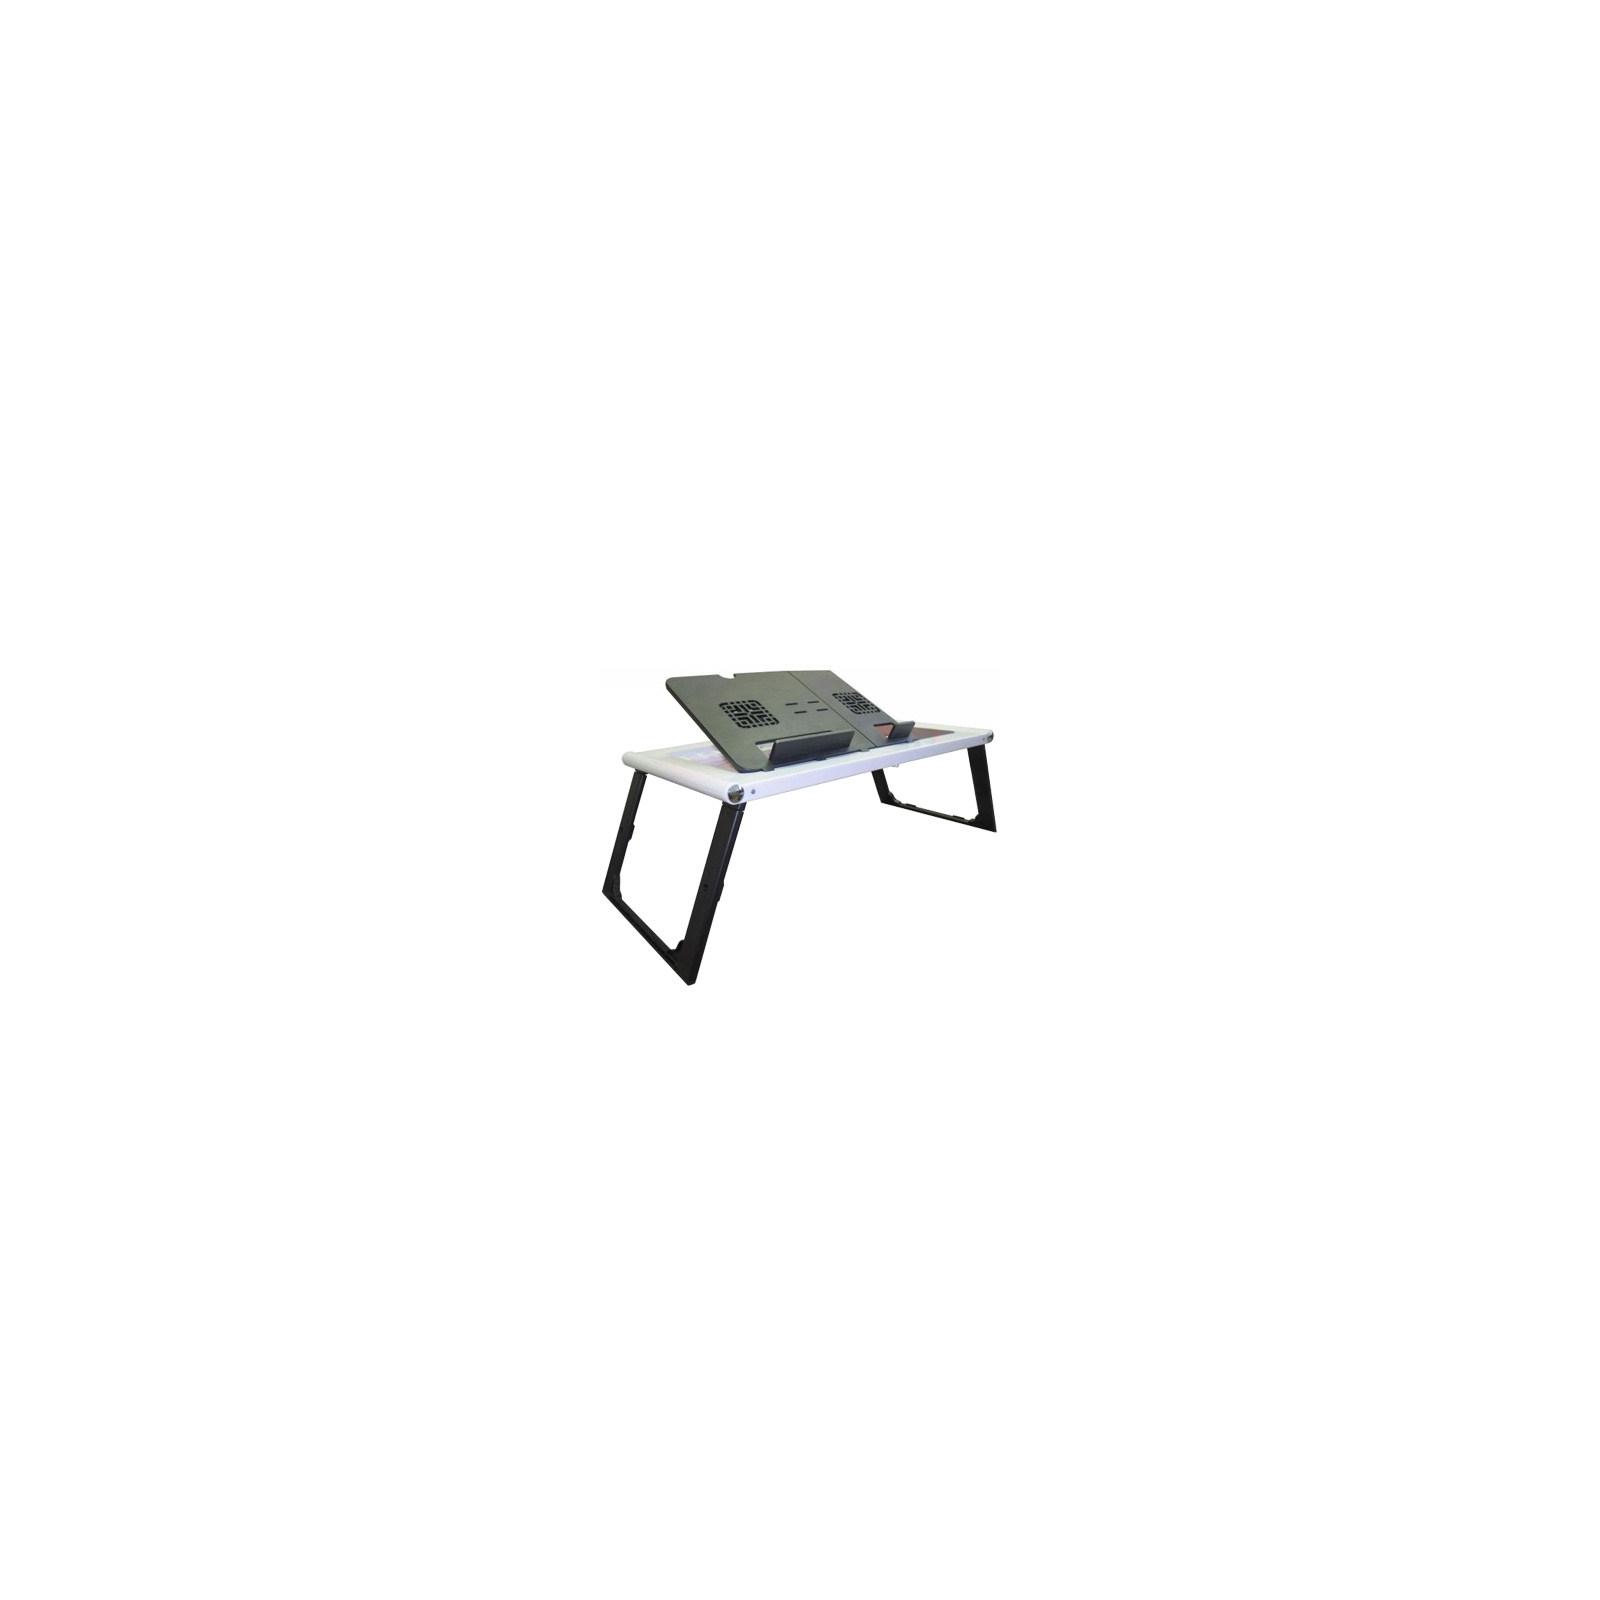 Подставка для ноутбука UFT Т15 white